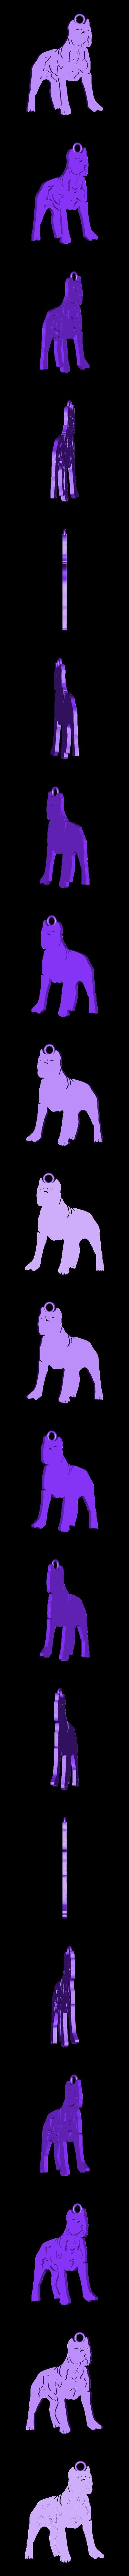 13.stl Download STL file Dogs • 3D printing object, GENNADI3313